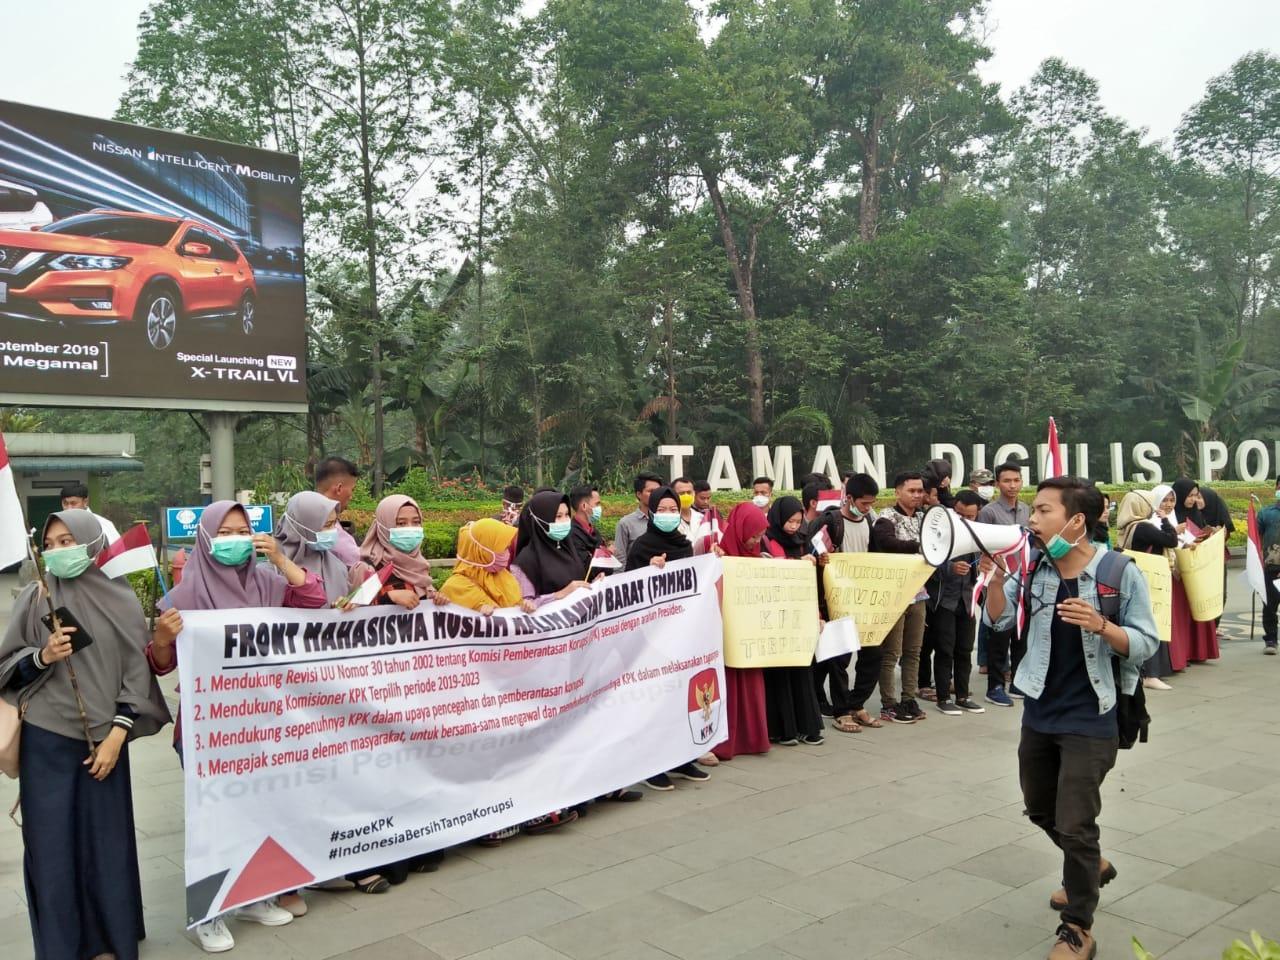 FMM Kalbar Gelar Aksi Dukungan Atas Revisi RUU KPK Demi Penguatan Kelembagaan